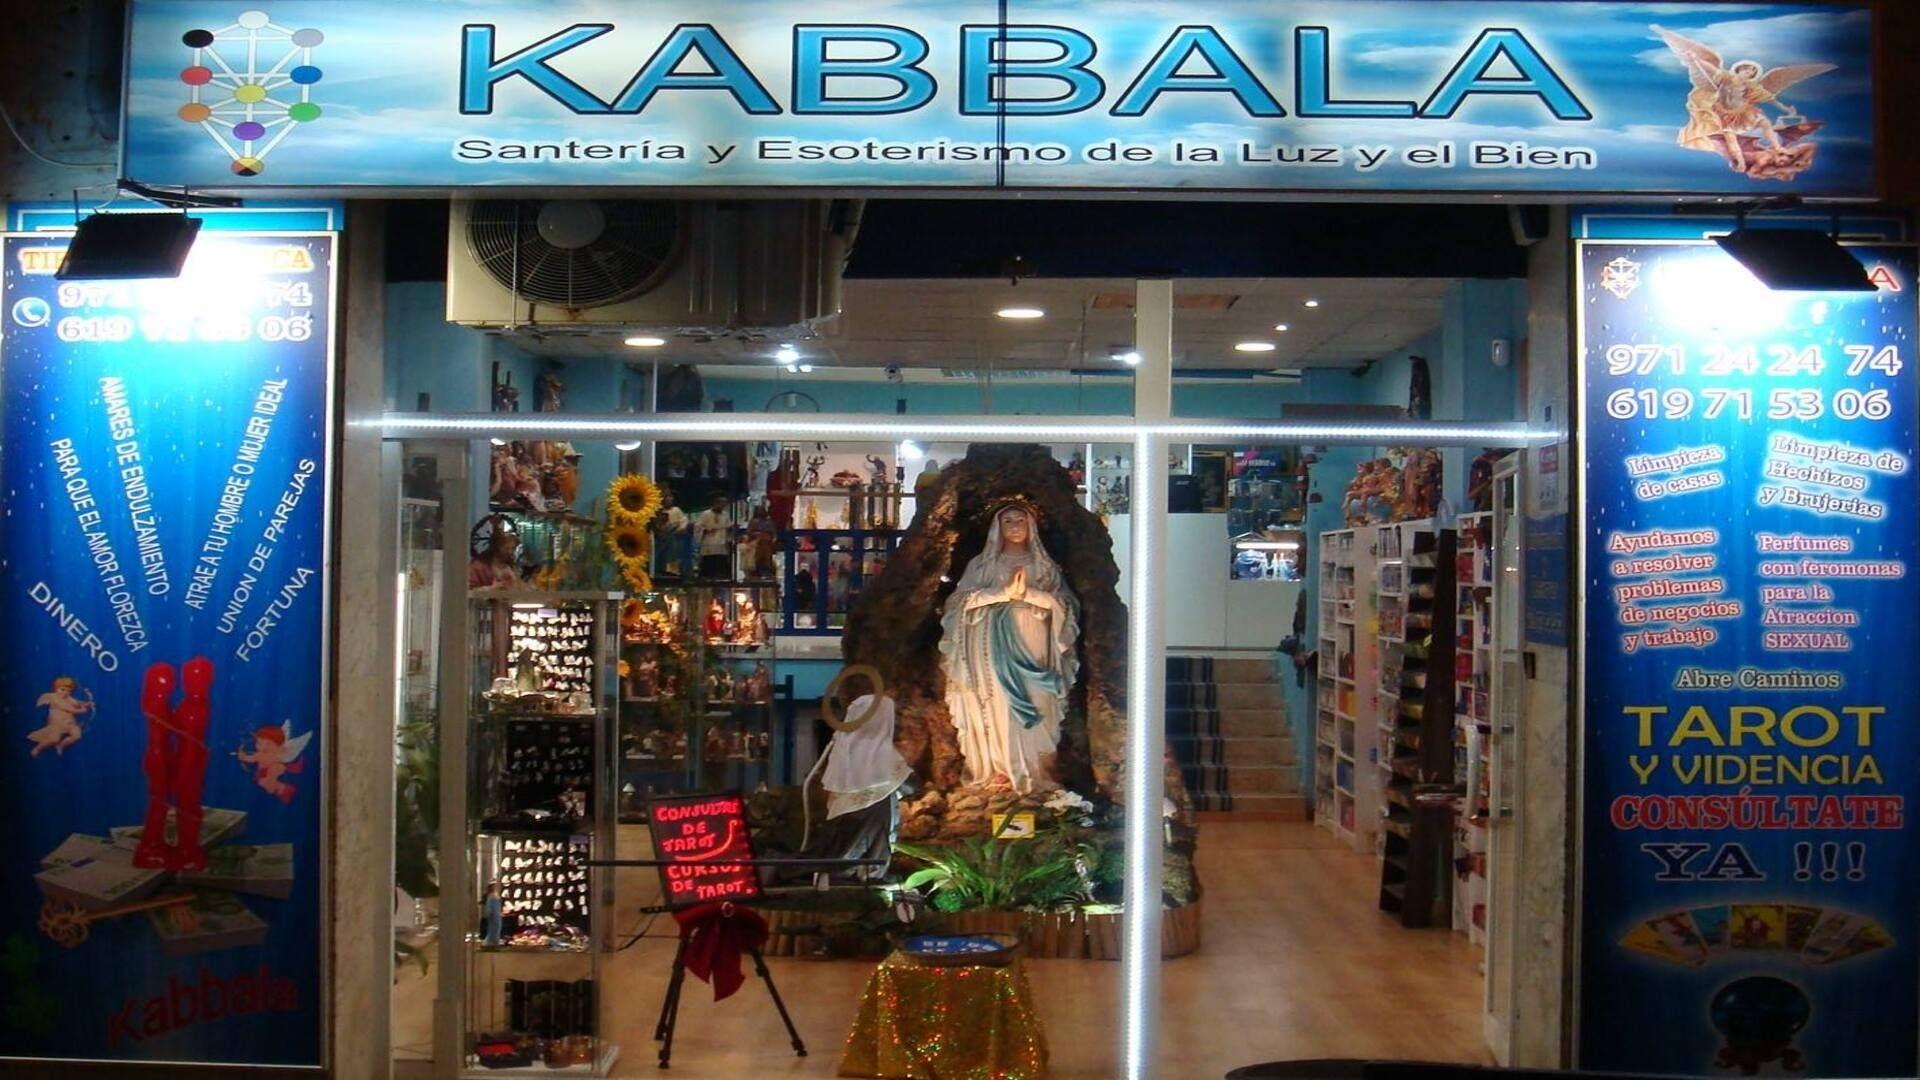 kabbala (2)